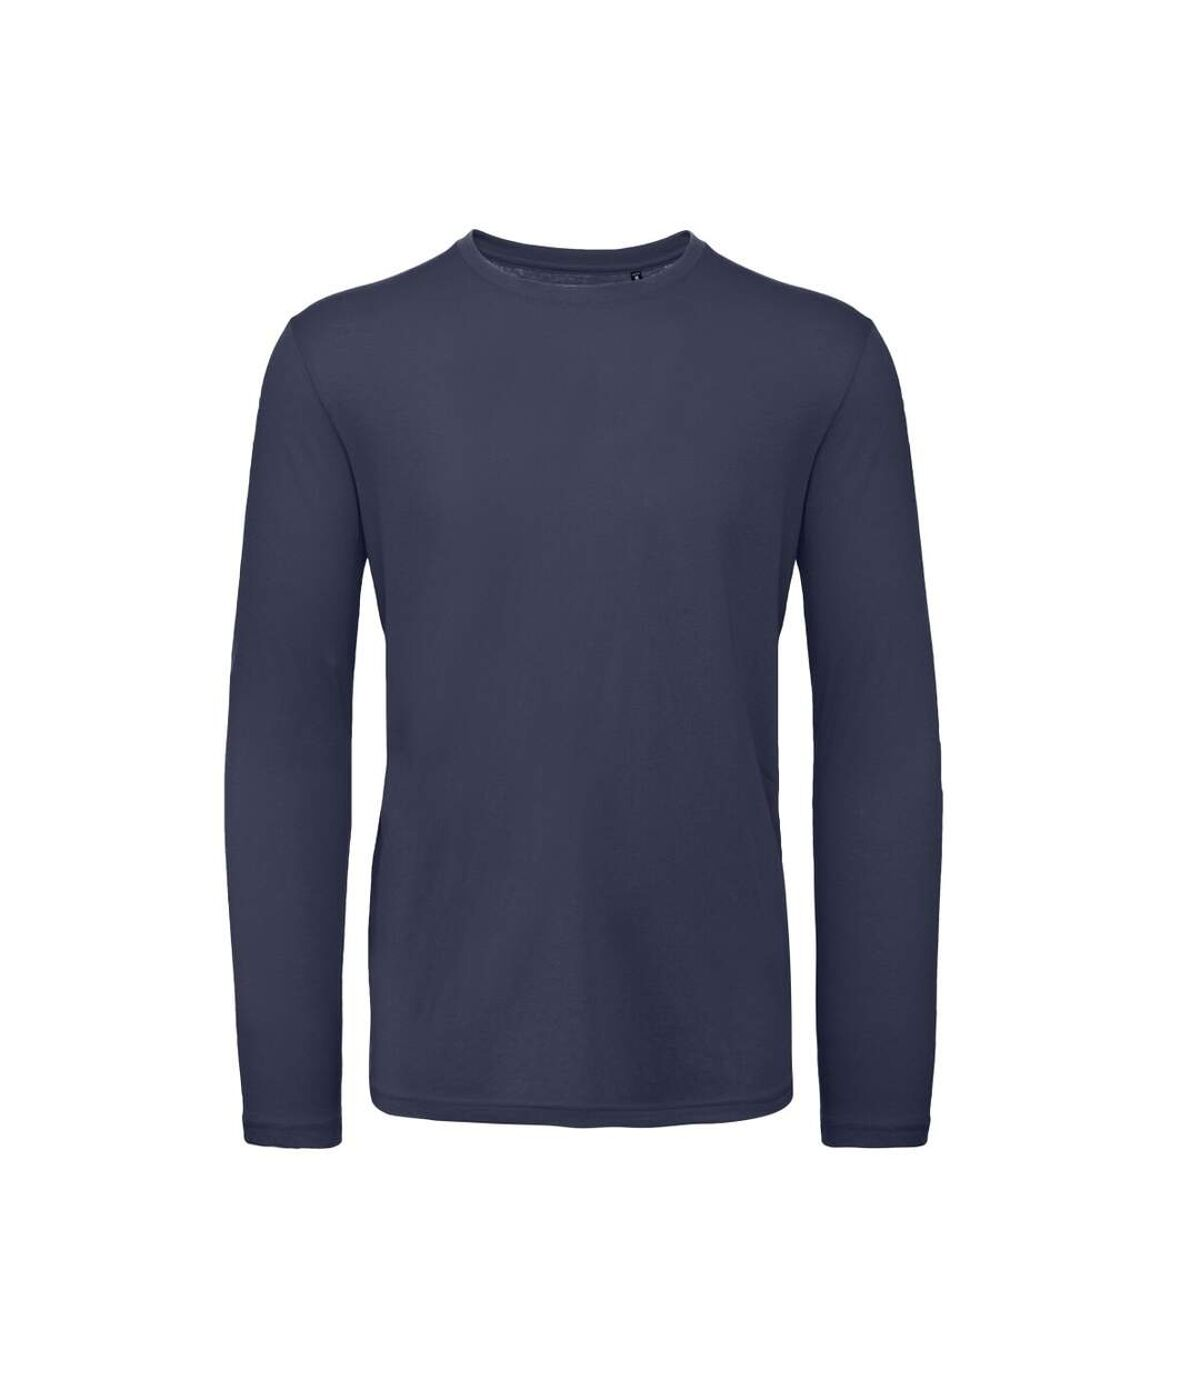 B&C Mens Inspire Long Sleeve Tee (Urban Navy) - UTBC3999